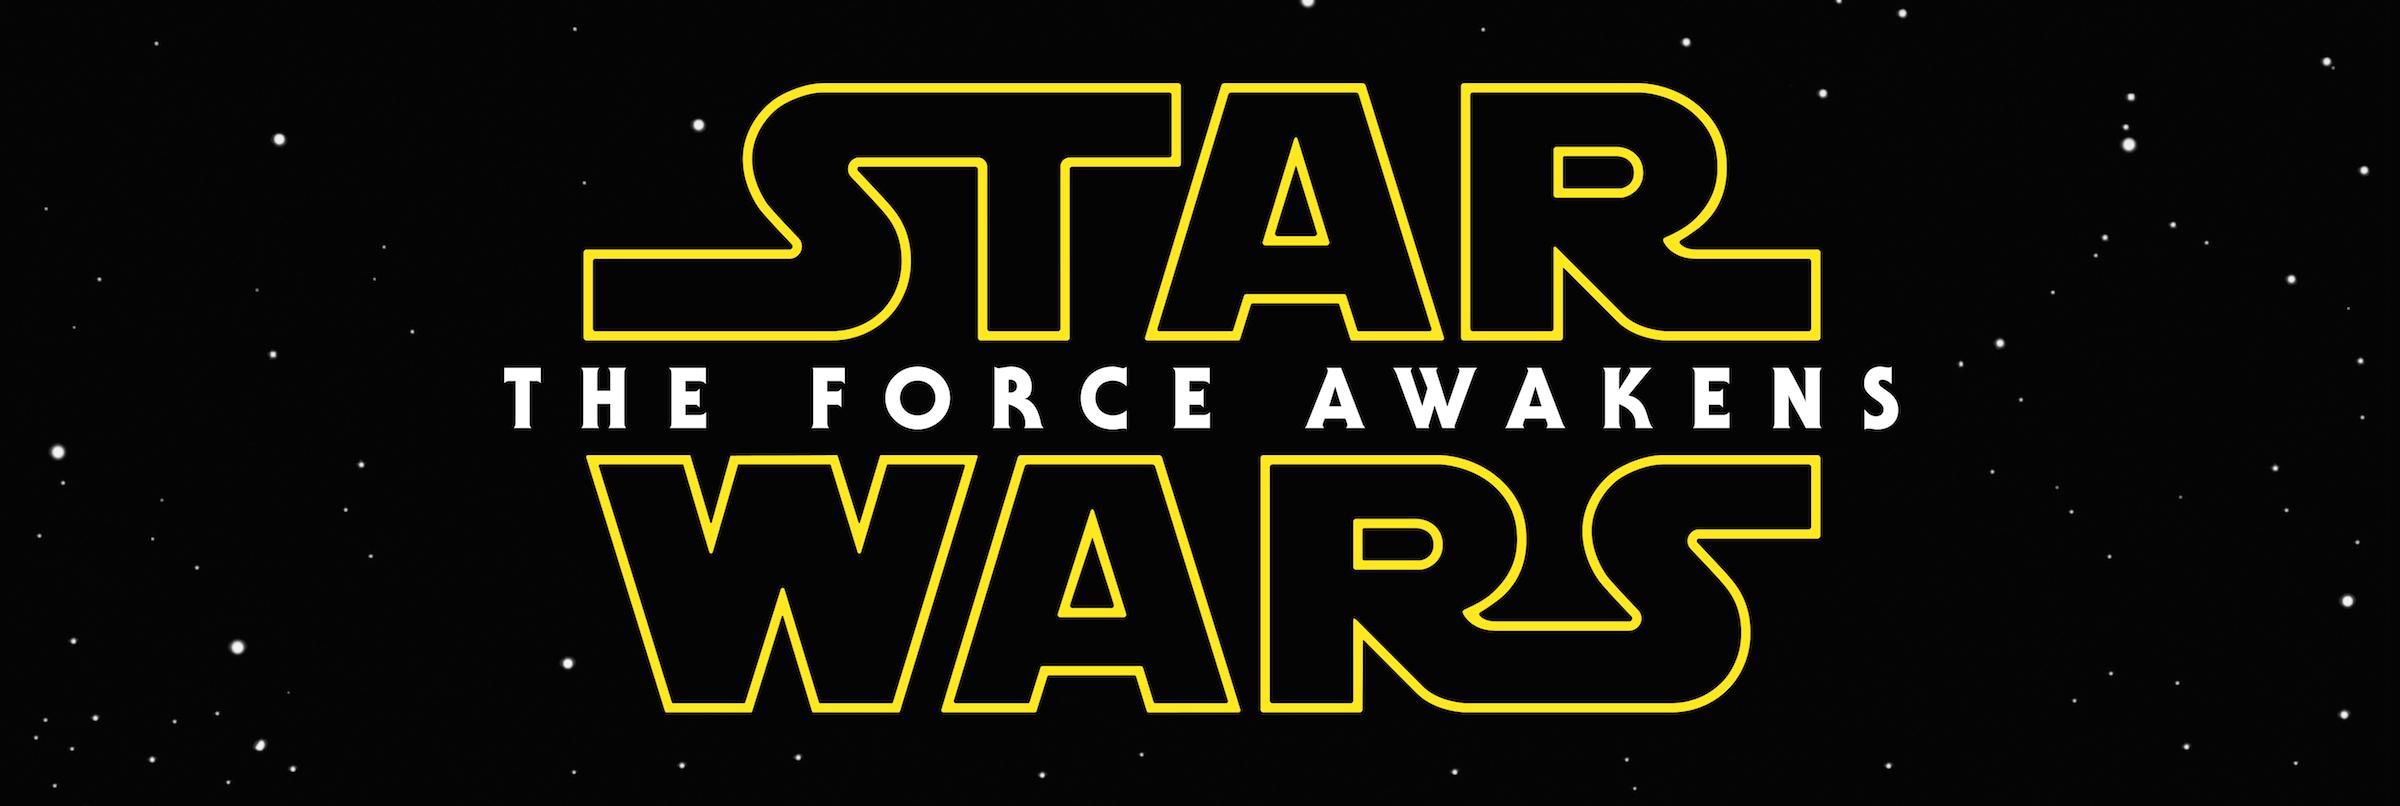 Star Wars Episode VII: The Force Awakens Recension GGGGG (inkl video)